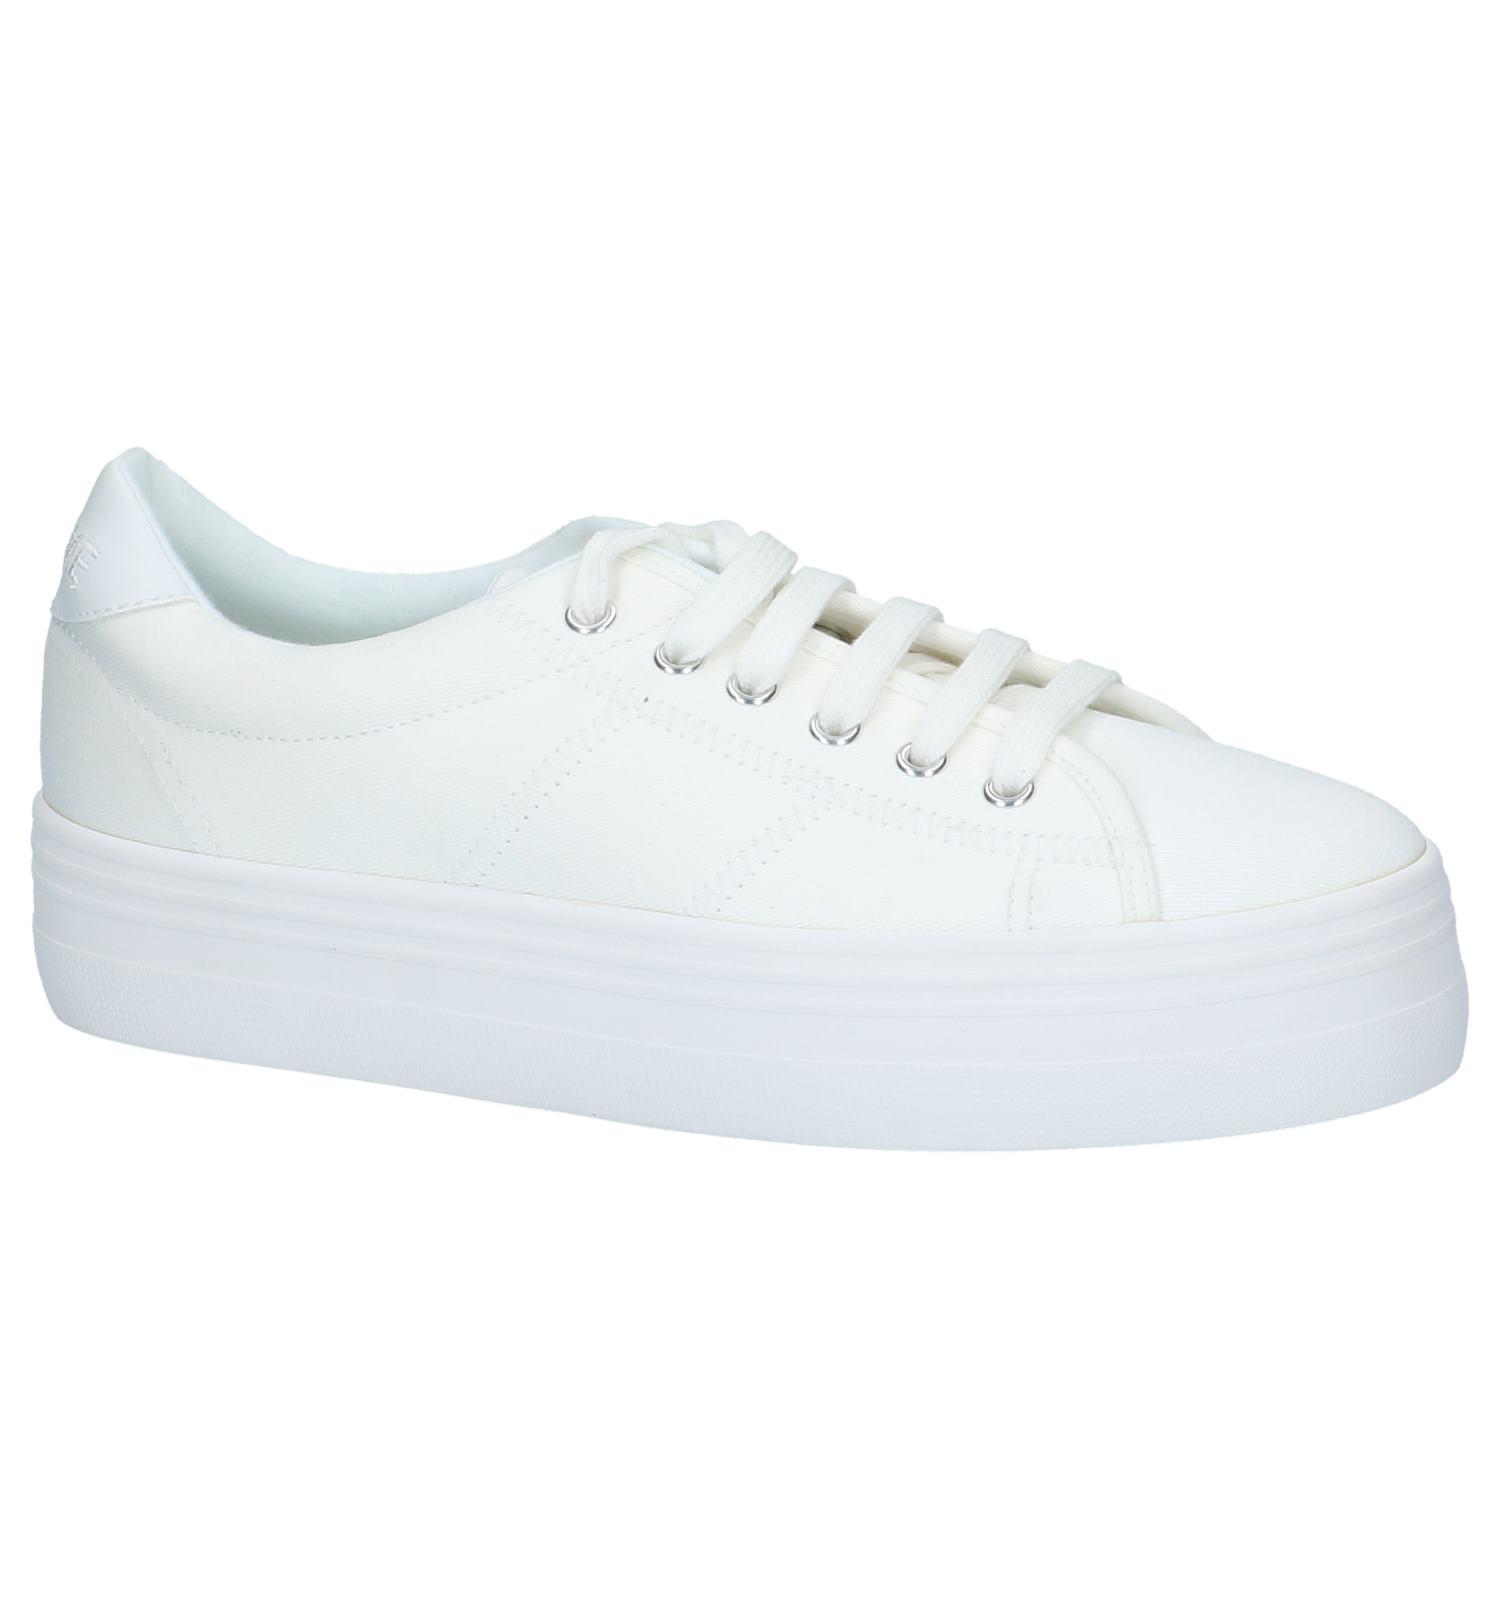 Witte Sneakers met Plateauzool No Name Plato Sneaker | SCHOENENTORFS.NL | Gratis verzend en retour